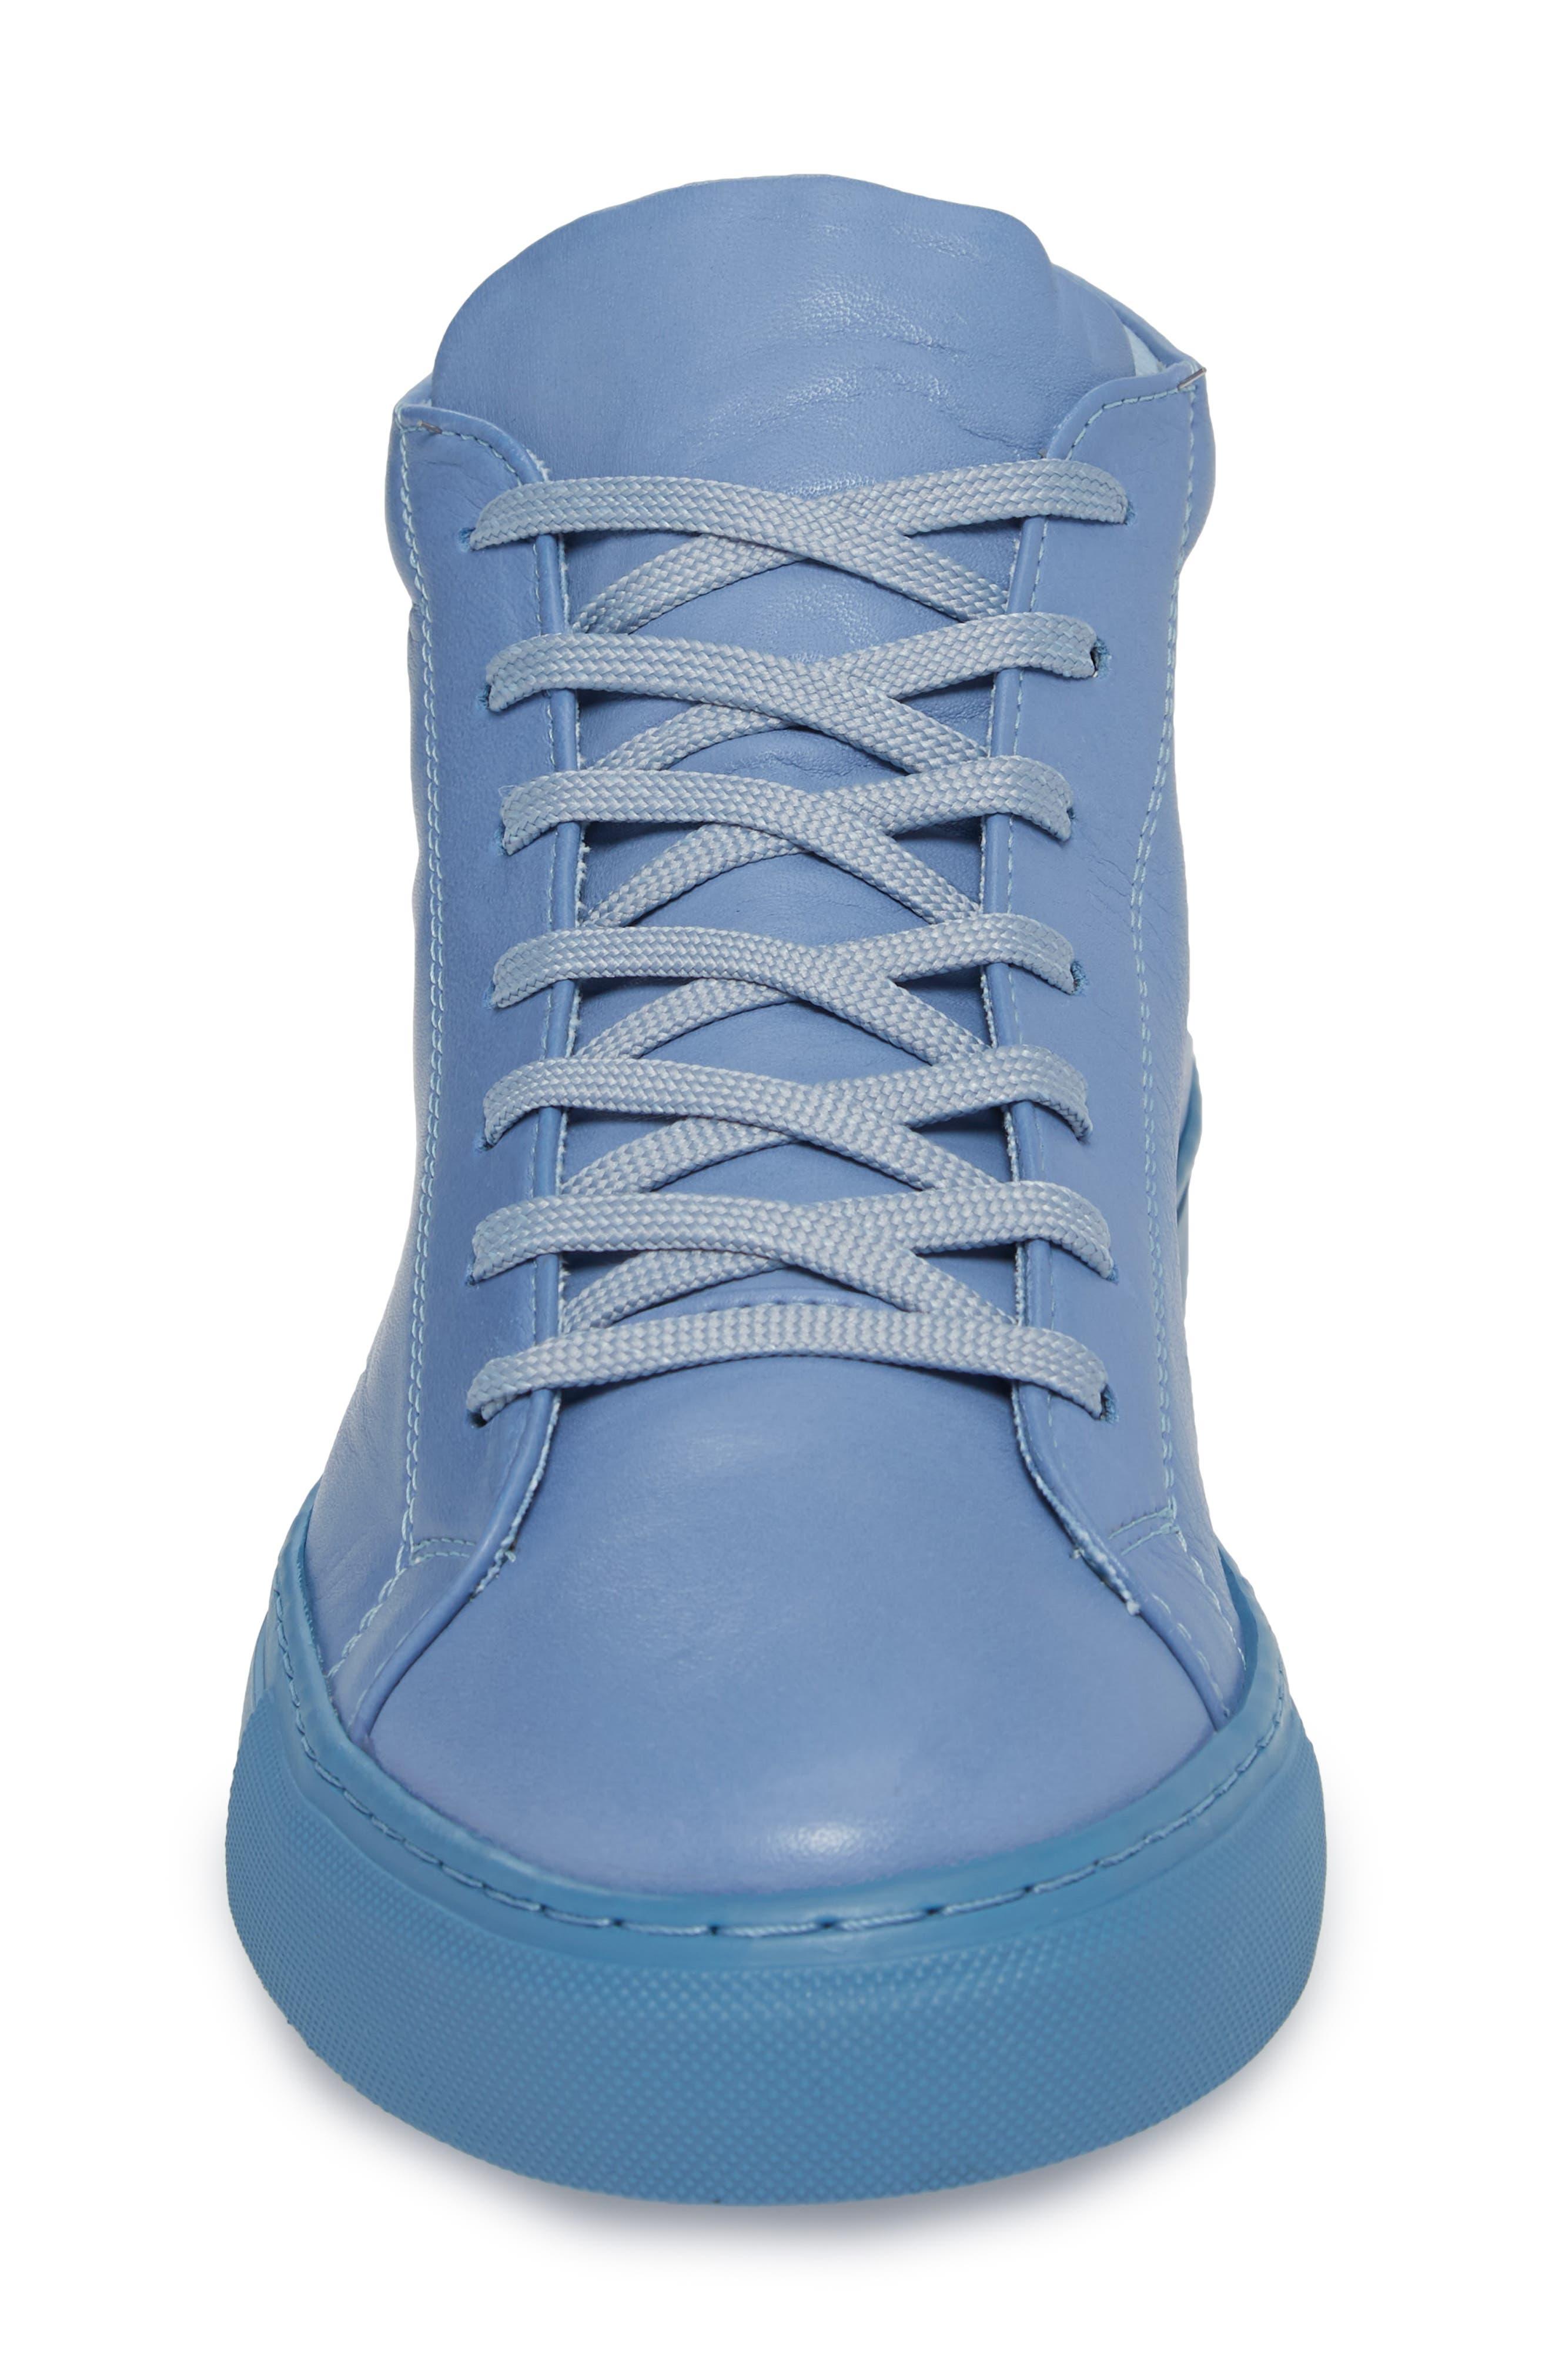 Lexington Mid Top Sneaker,                             Alternate thumbnail 11, color,